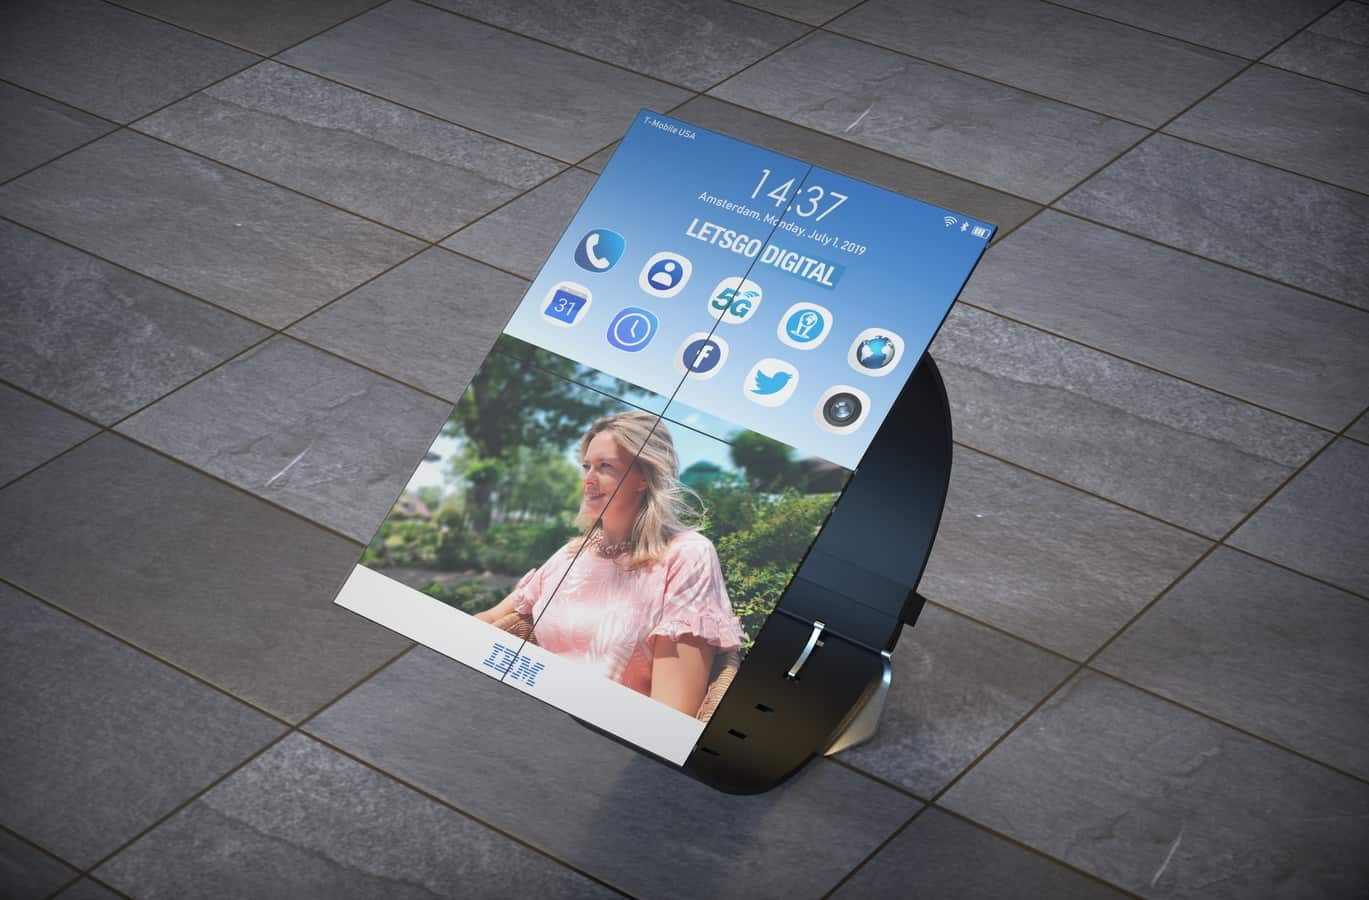 IBM smartwatch patent 3